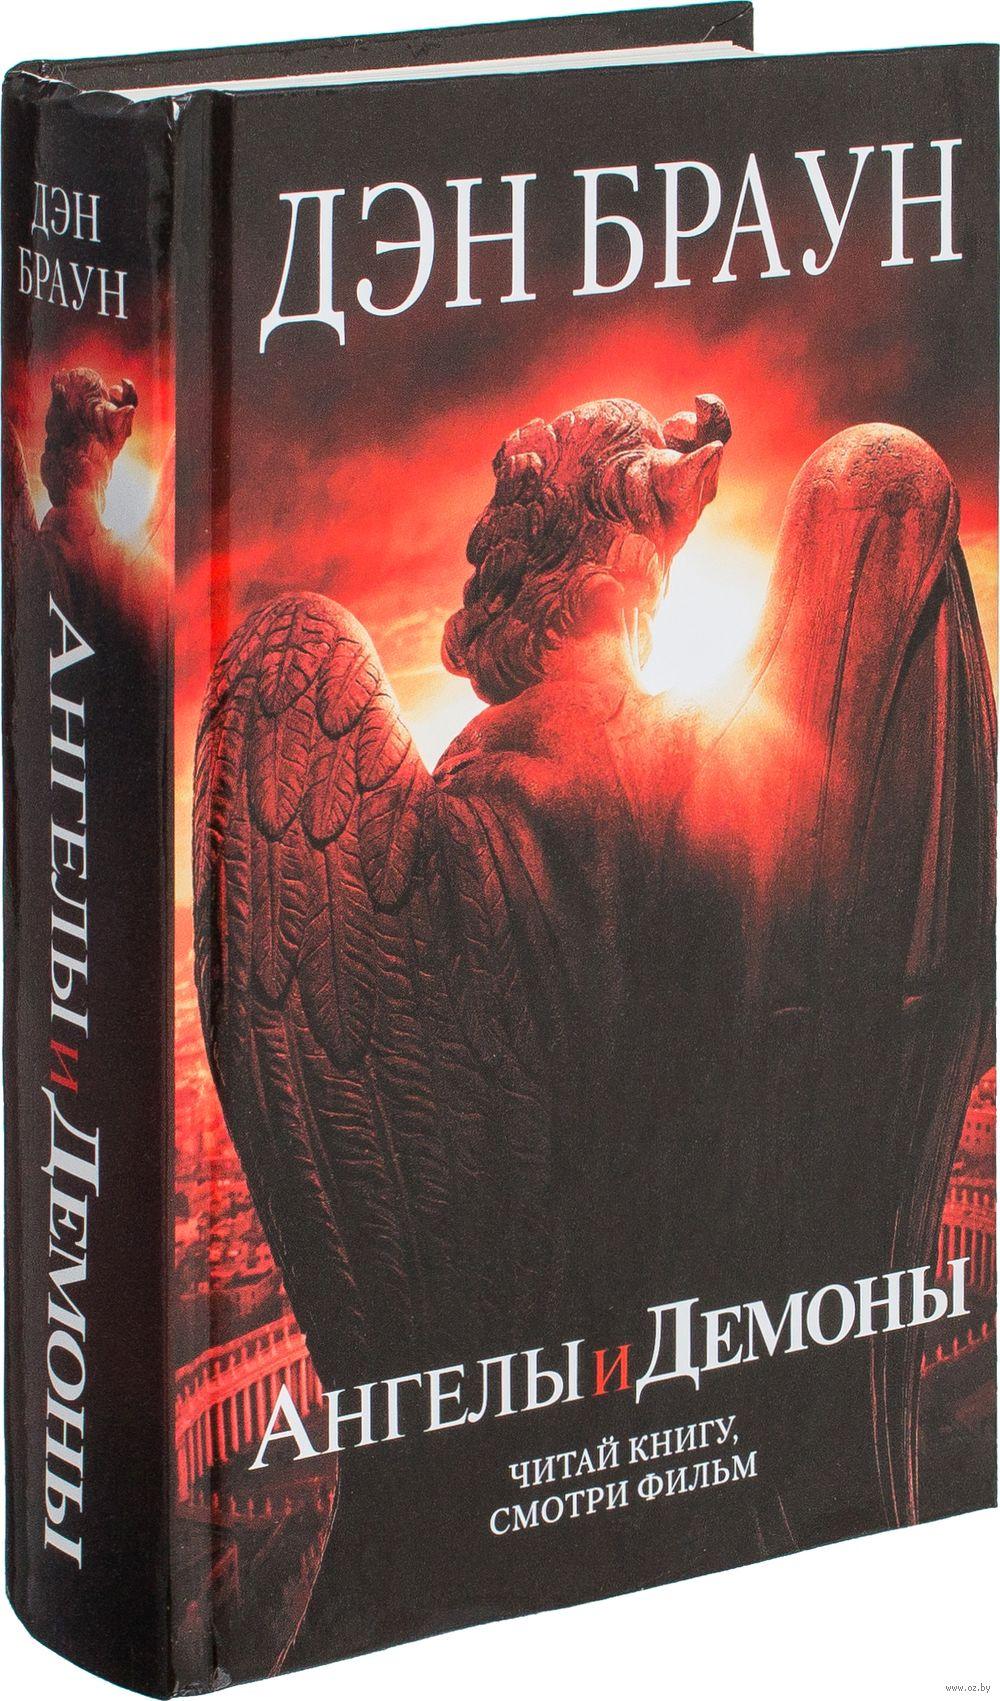 Ангелы и демоны дэн браун скачать книгу